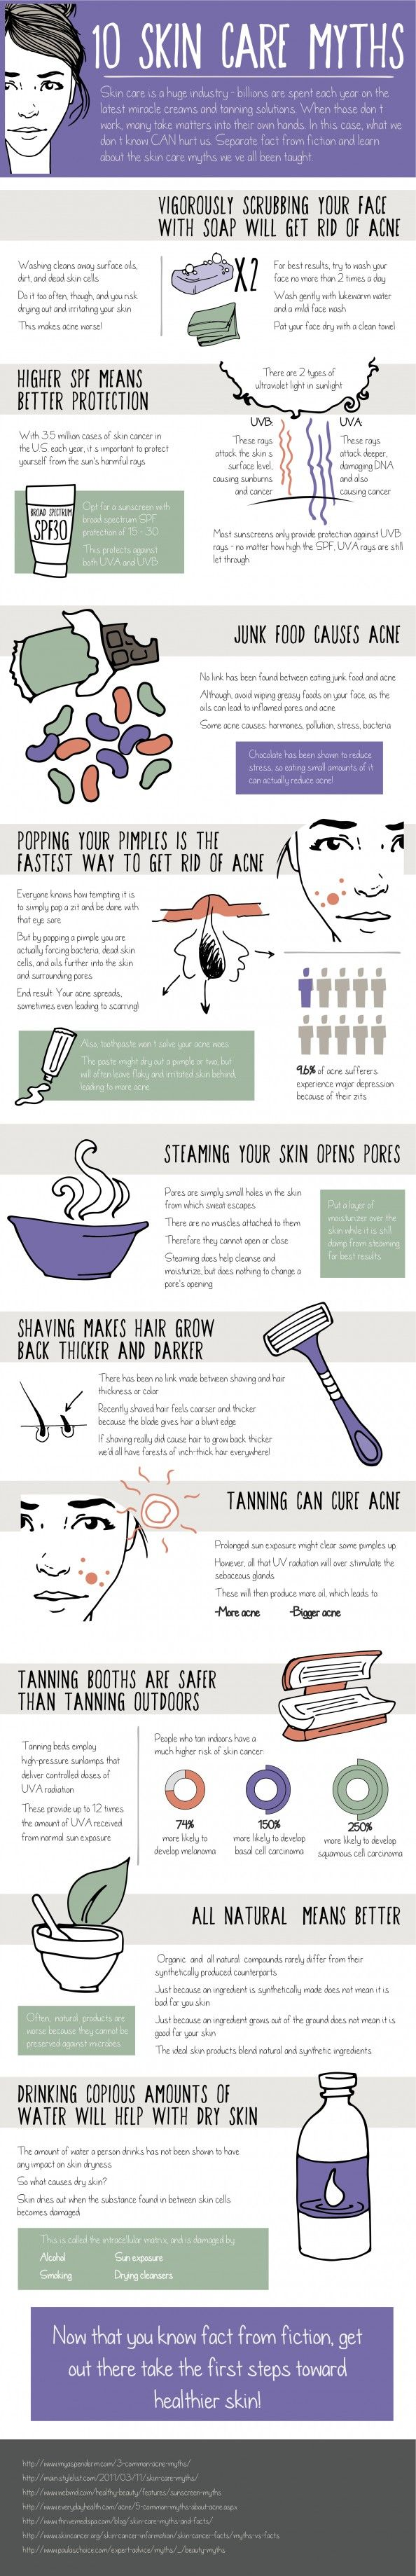 10 Skin Care Myths